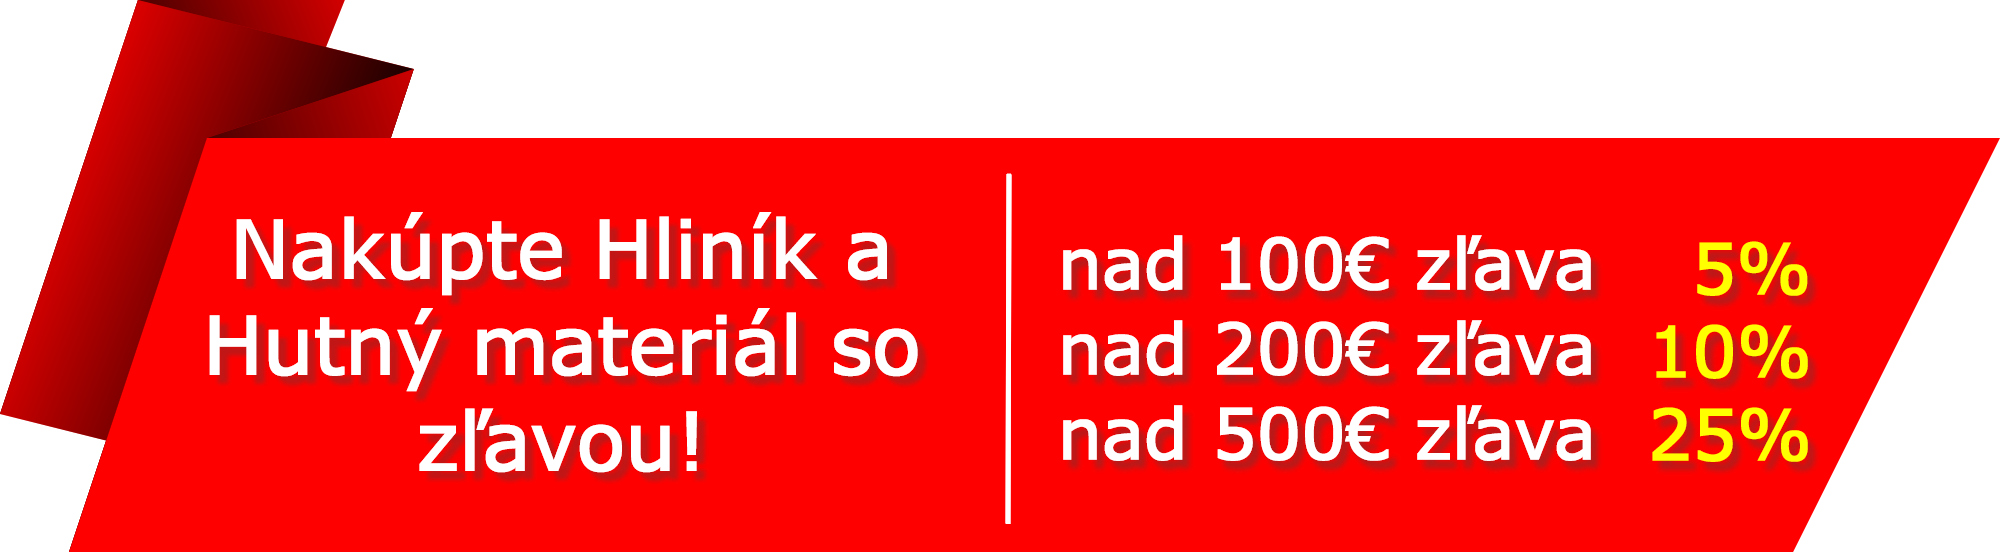 Banner1(1)(1)